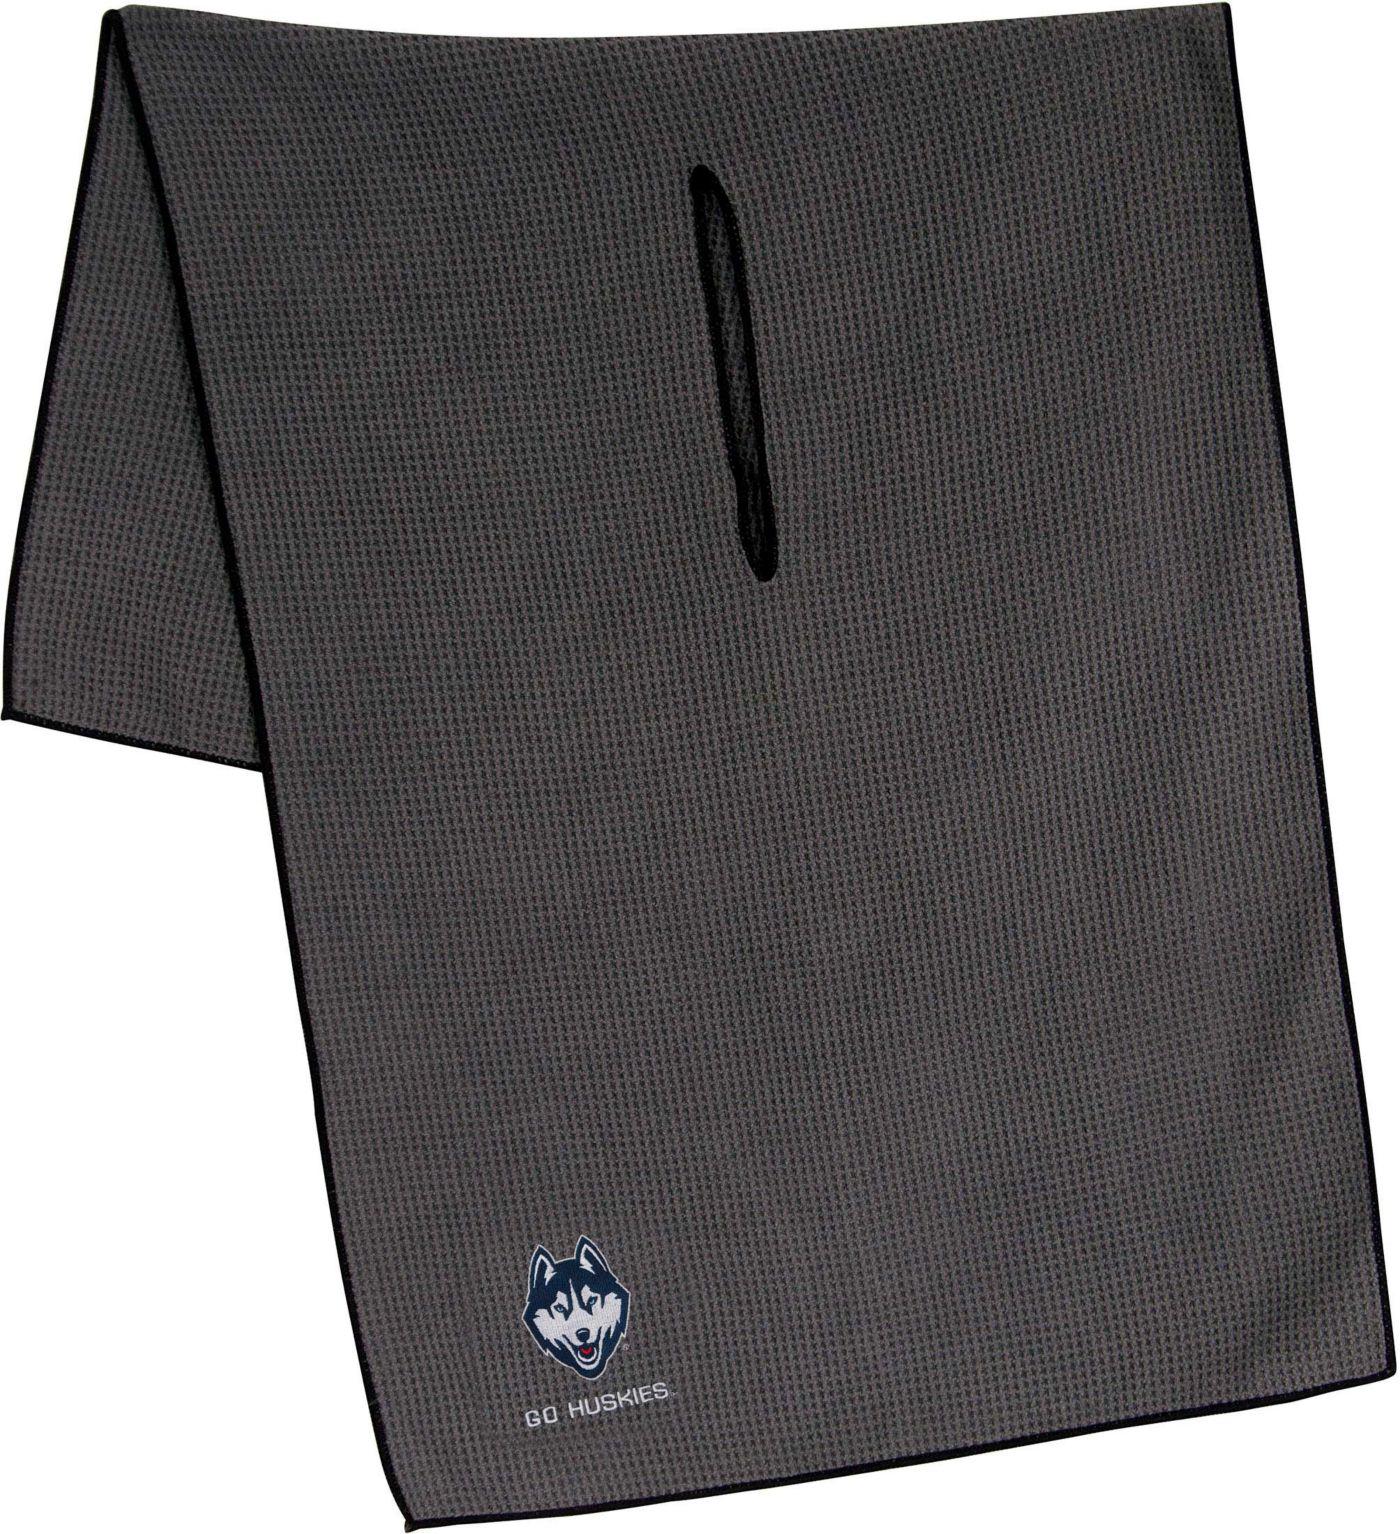 "Team Effort UConn Huskies 19"" x 41"" Microfiber Golf Towel"